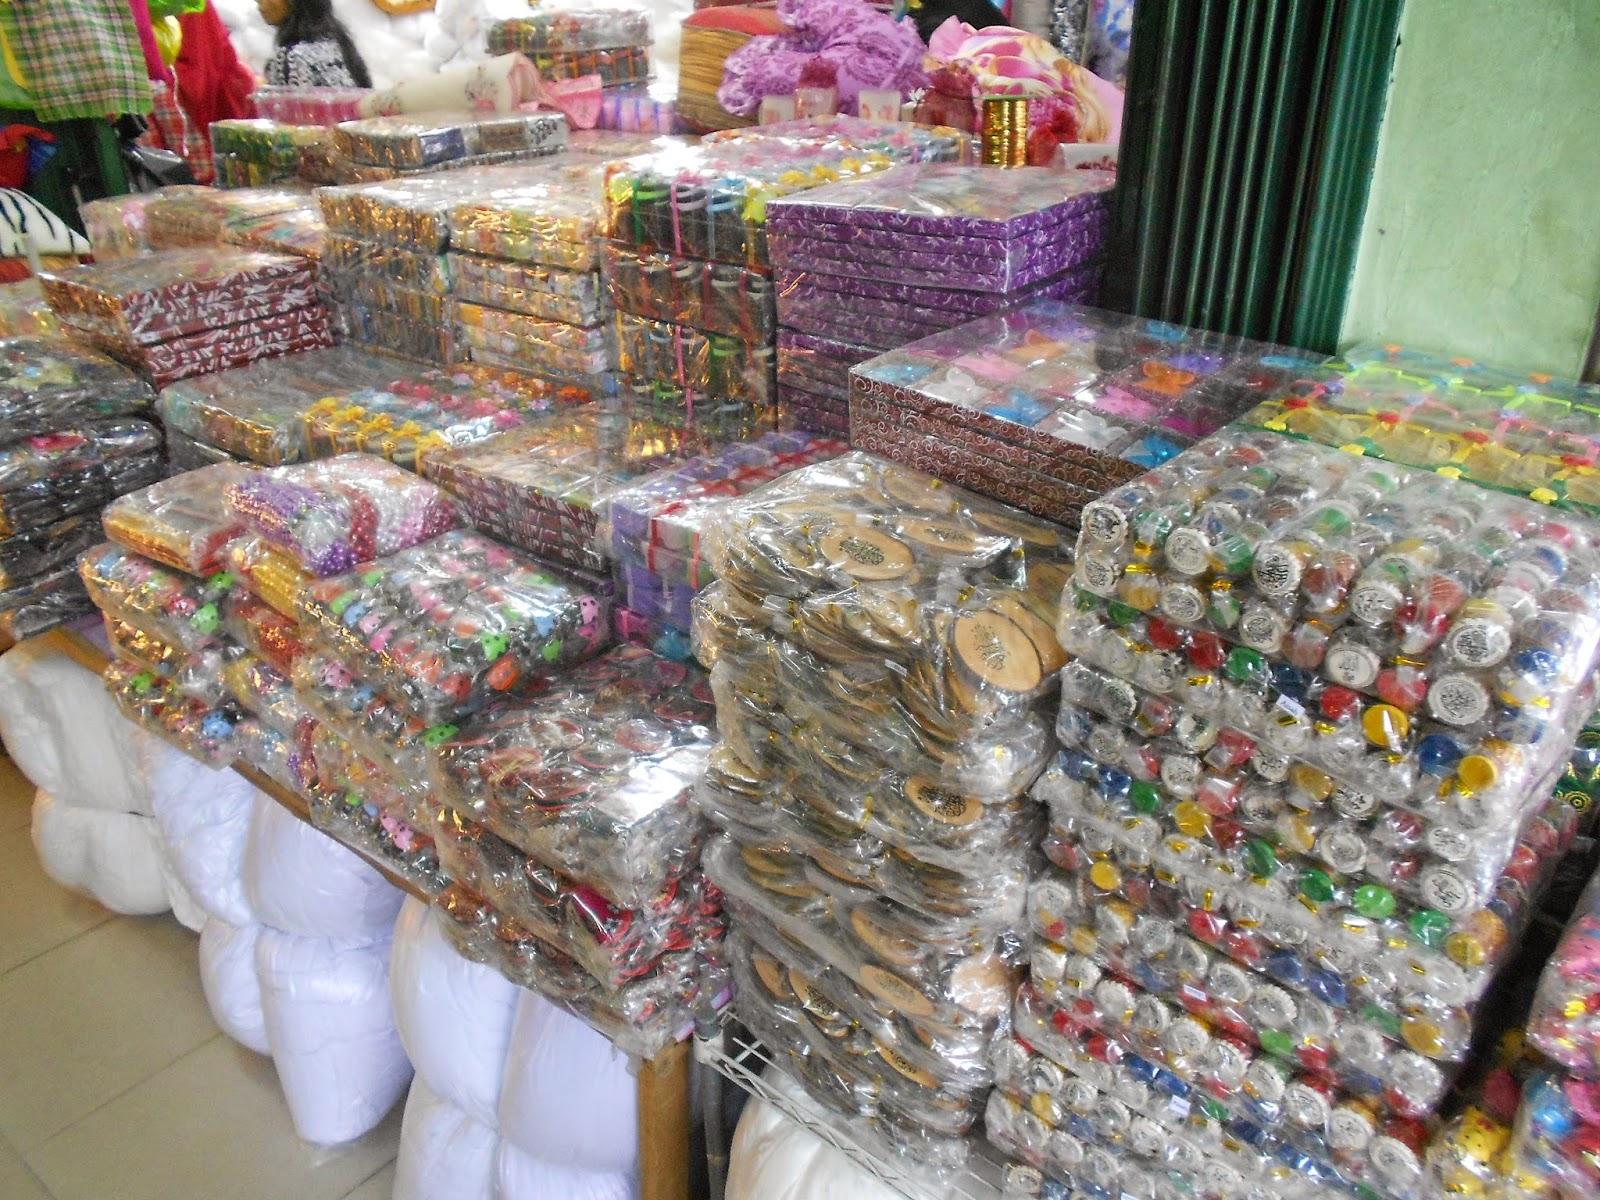 Pekanbaru Indonesia  city images : Jom Jalan Jalan: Bercuti di Pekanbaru, Indonesia : Membeli belah